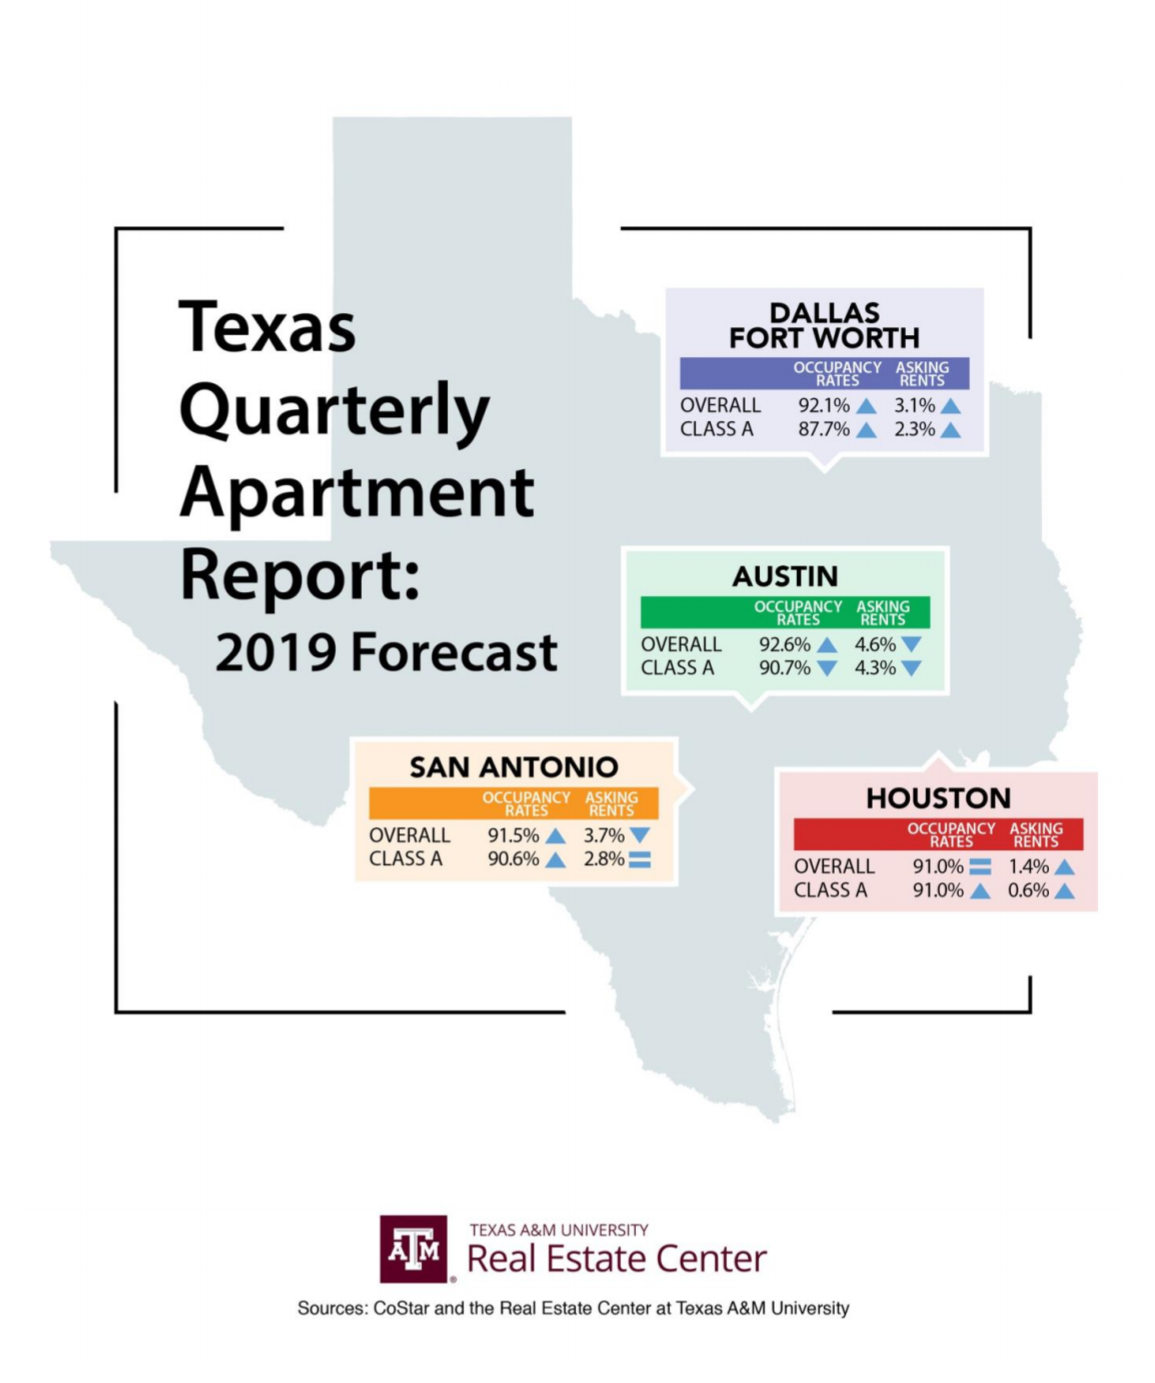 Texas Quarterly Apartment Report